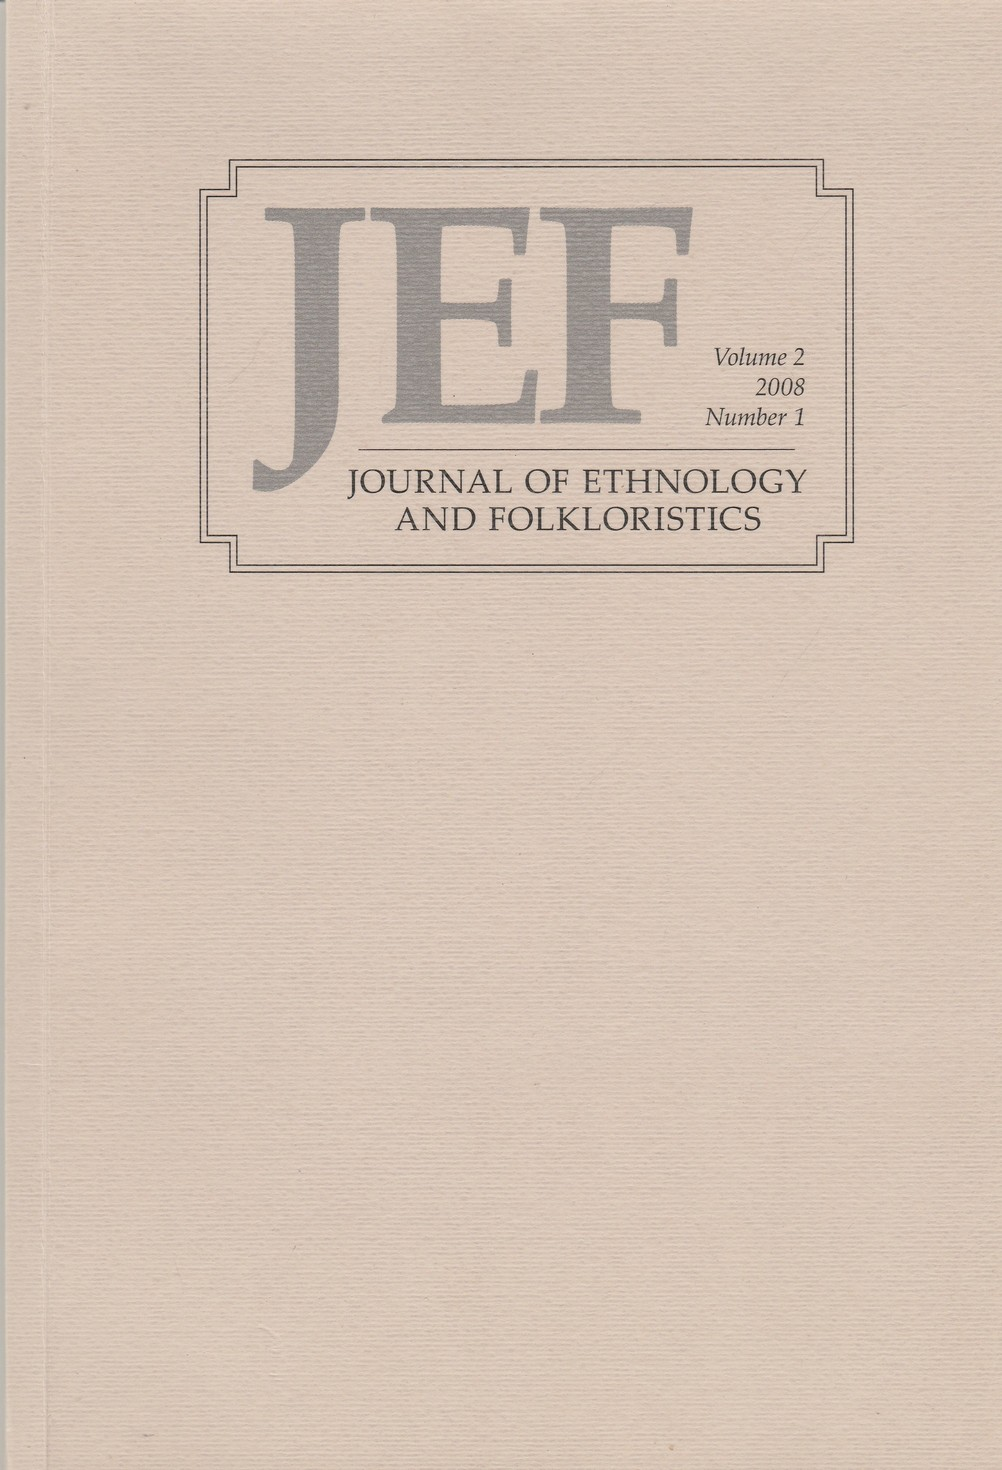 Journal of Ethnology and Folkloristsics